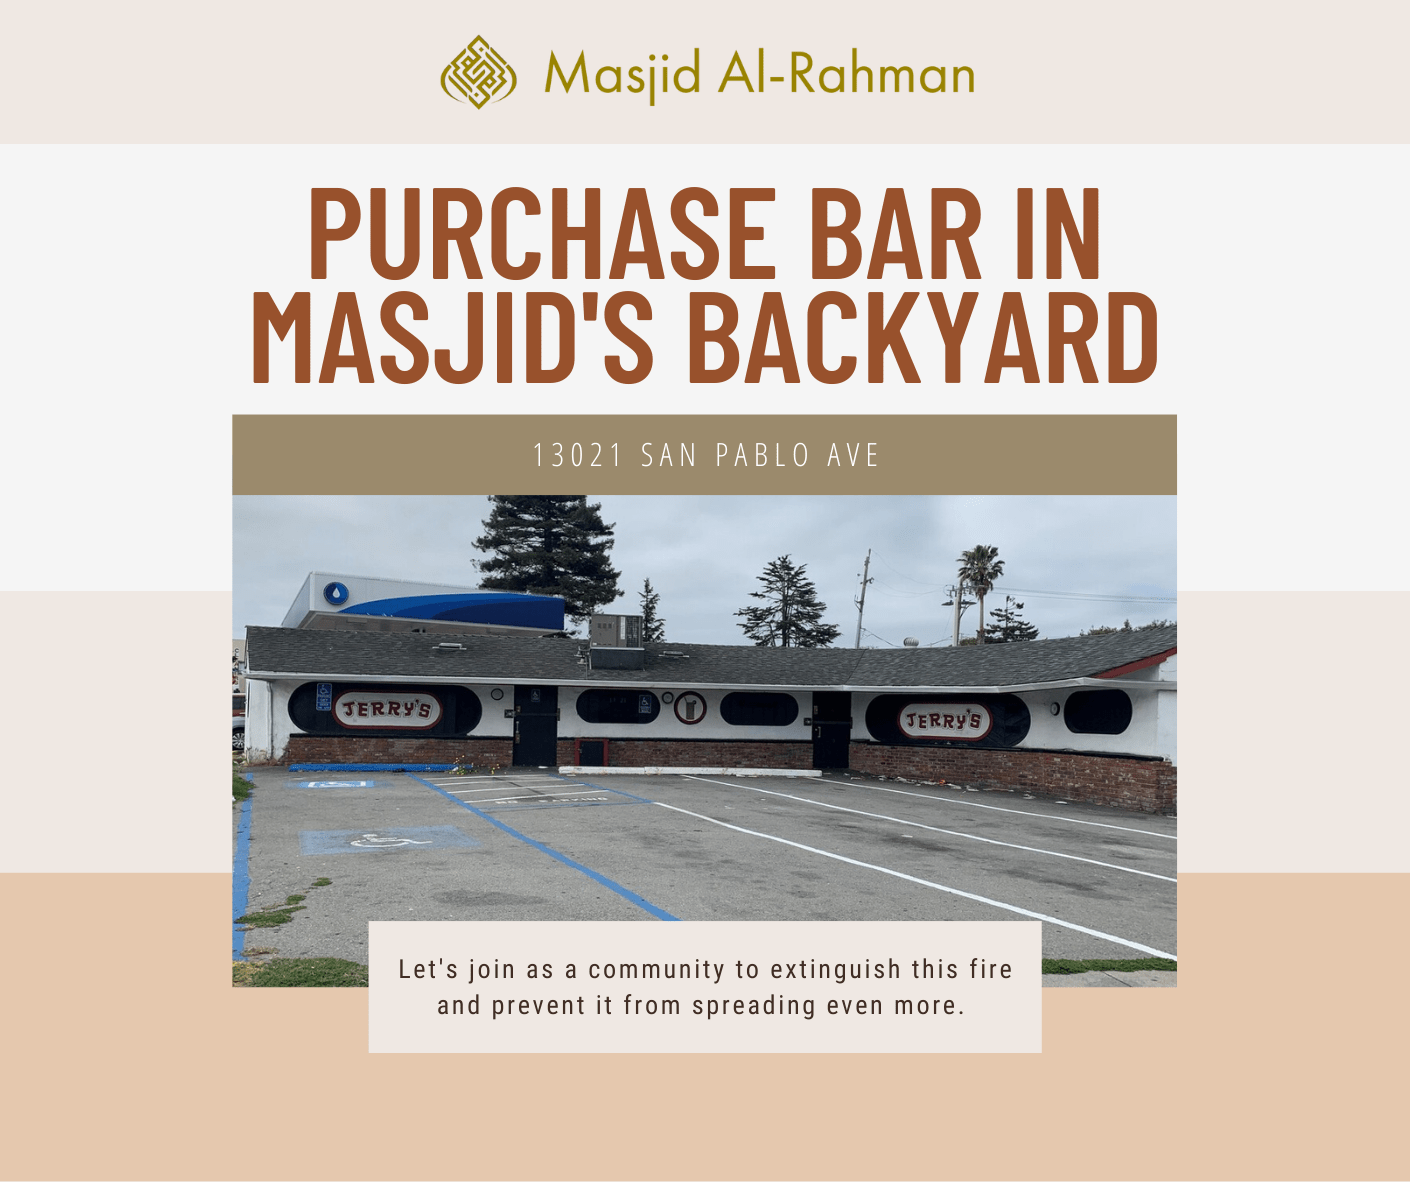 Masjid Al-Rahman Community Meeting - Property Purchase